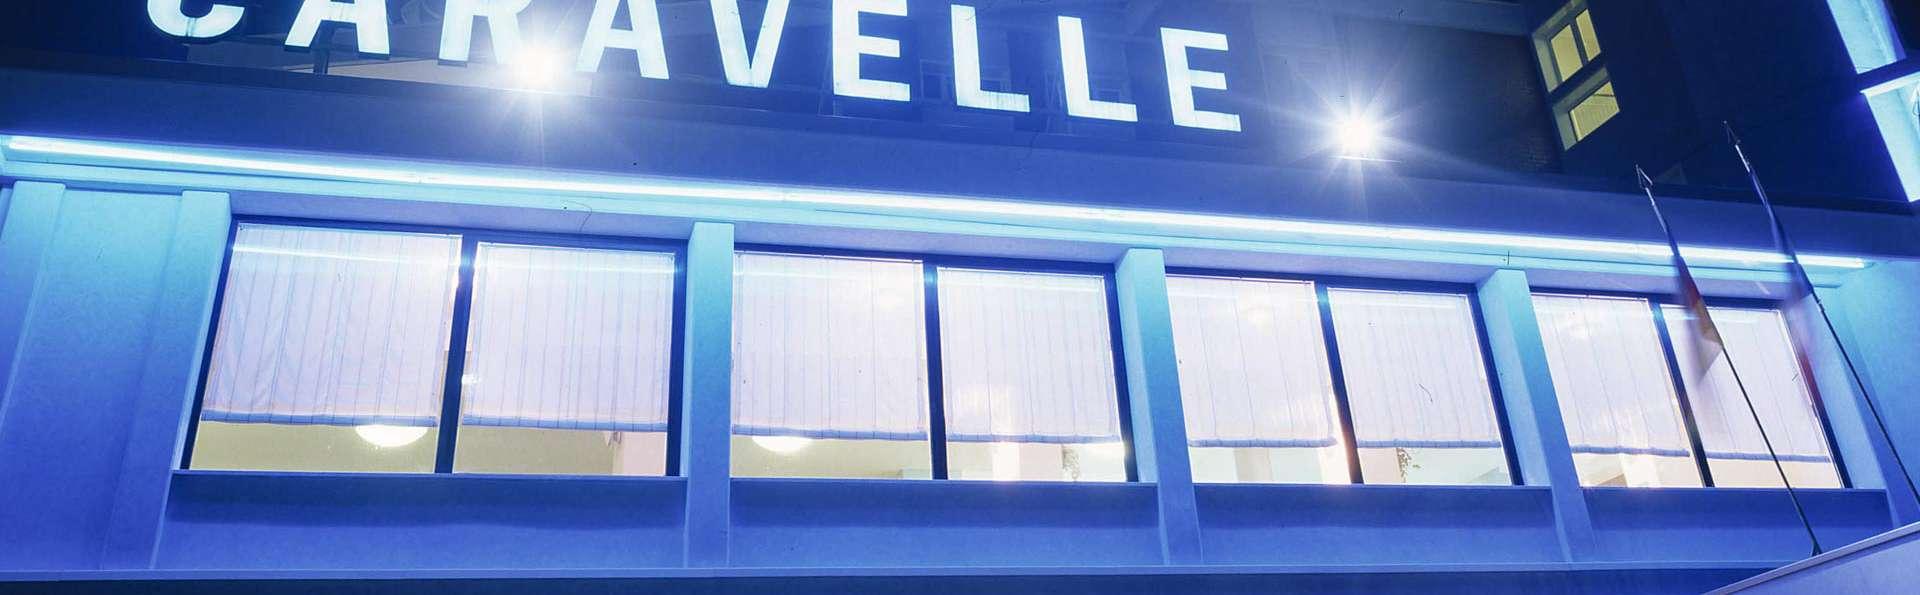 Hotel Caravelle - EDIT_FRONT_02.jpg